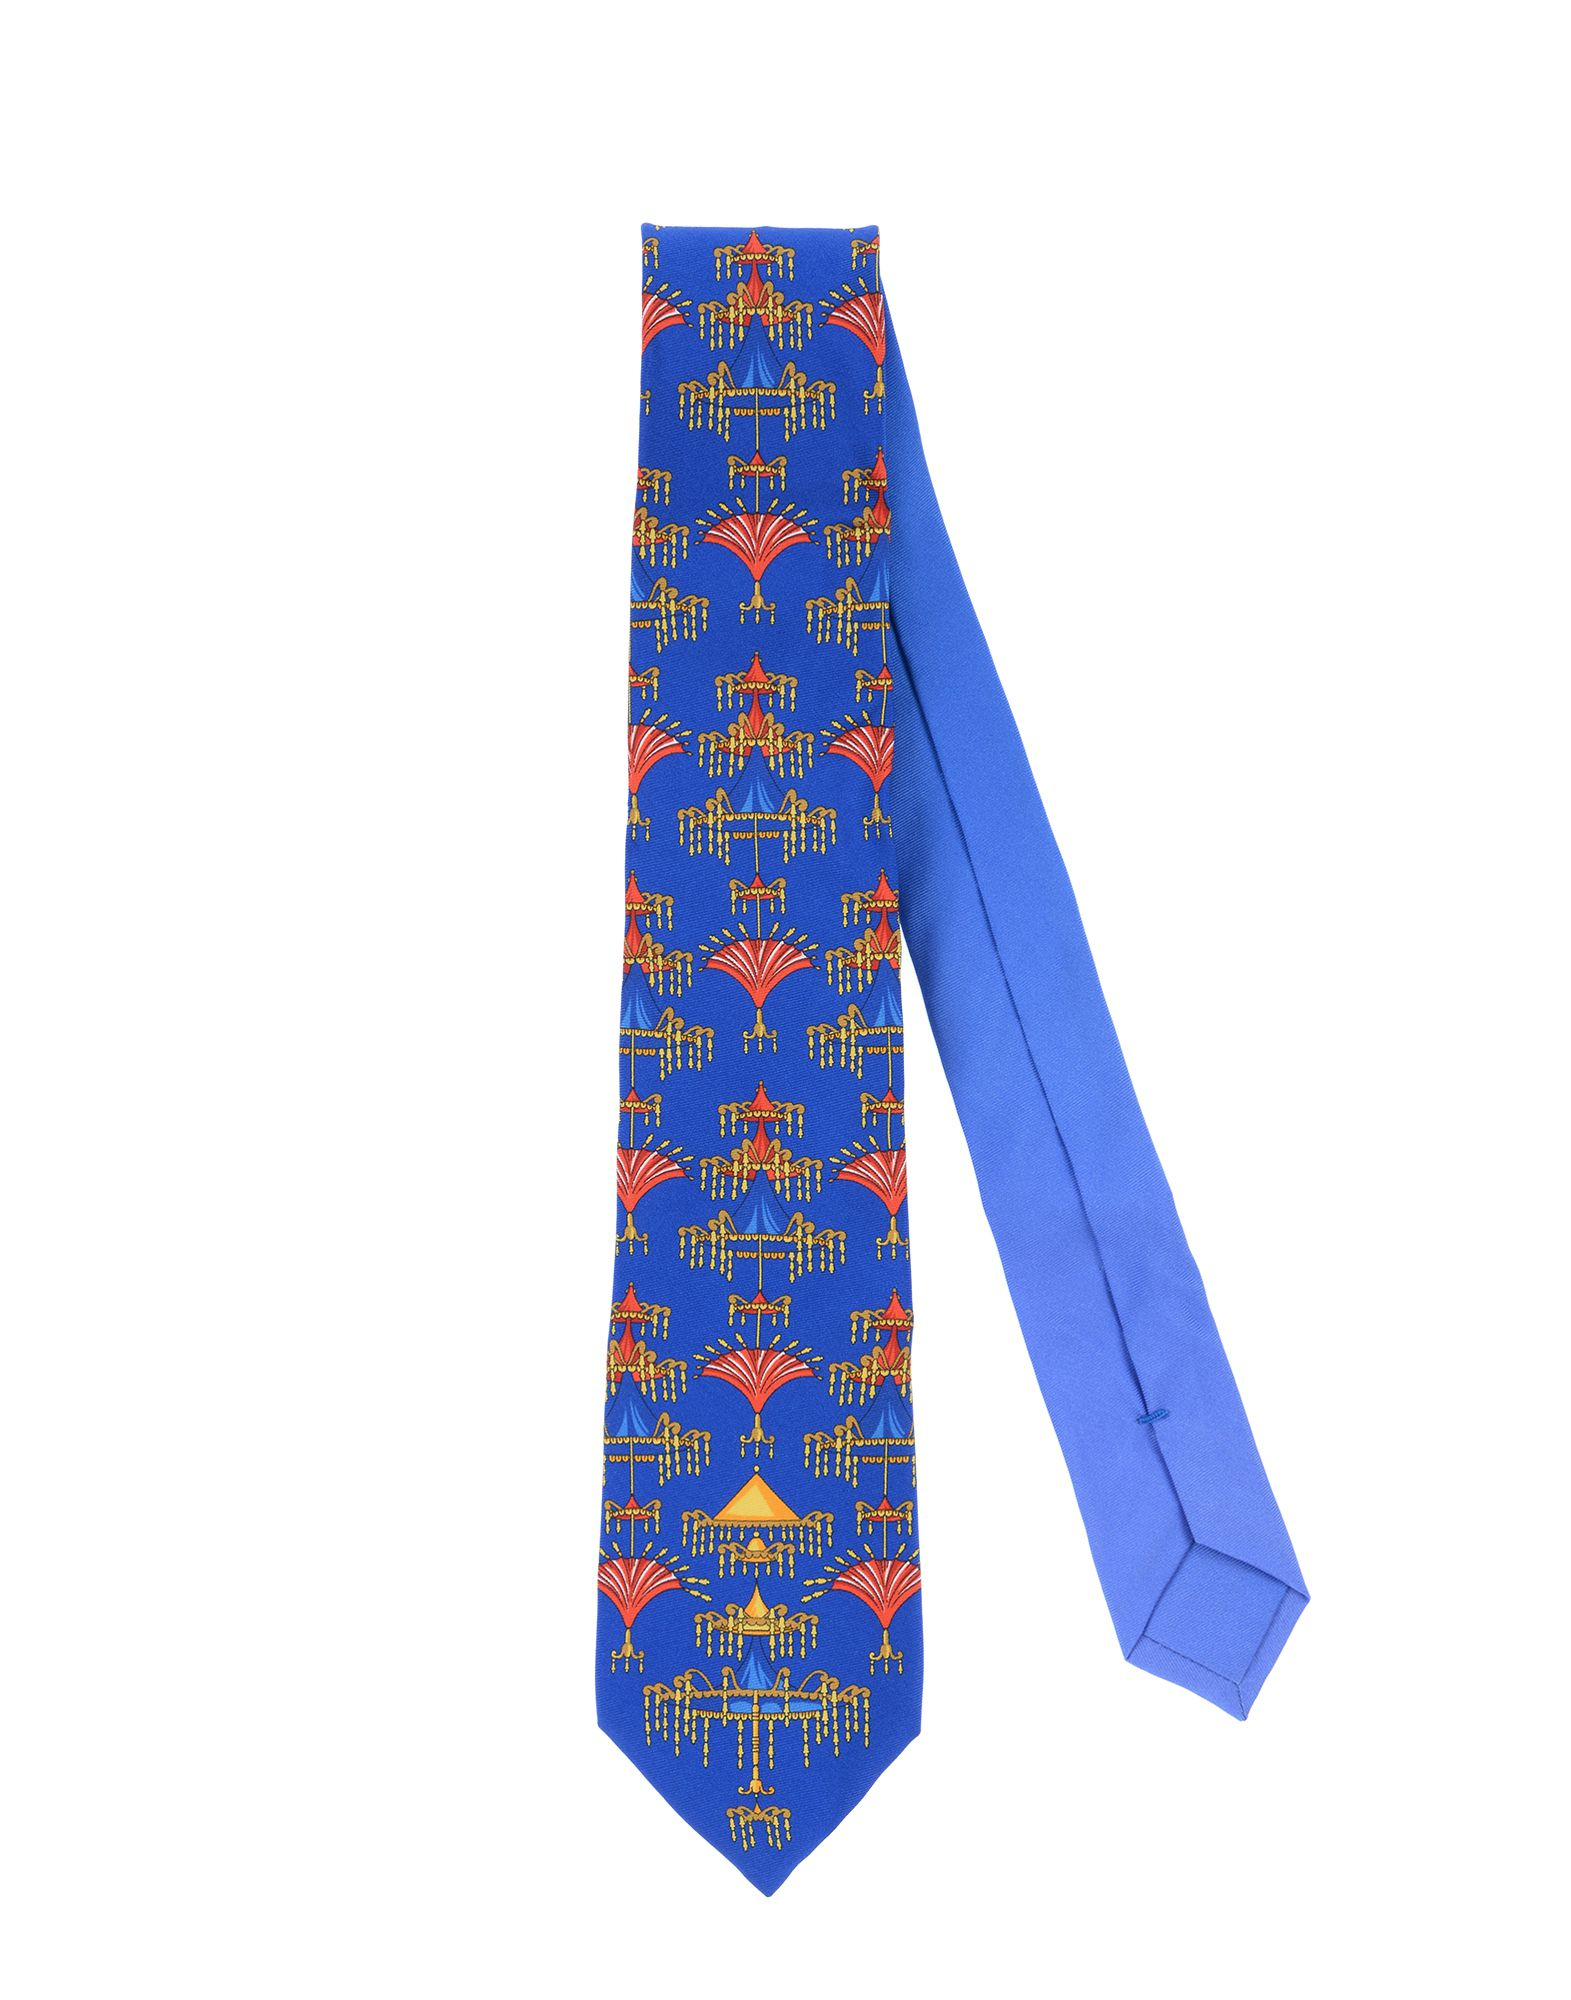 VERSACE Галстук versace бордовый галстук в клетку внизу с логотипом versace 821752 page 5 page 3